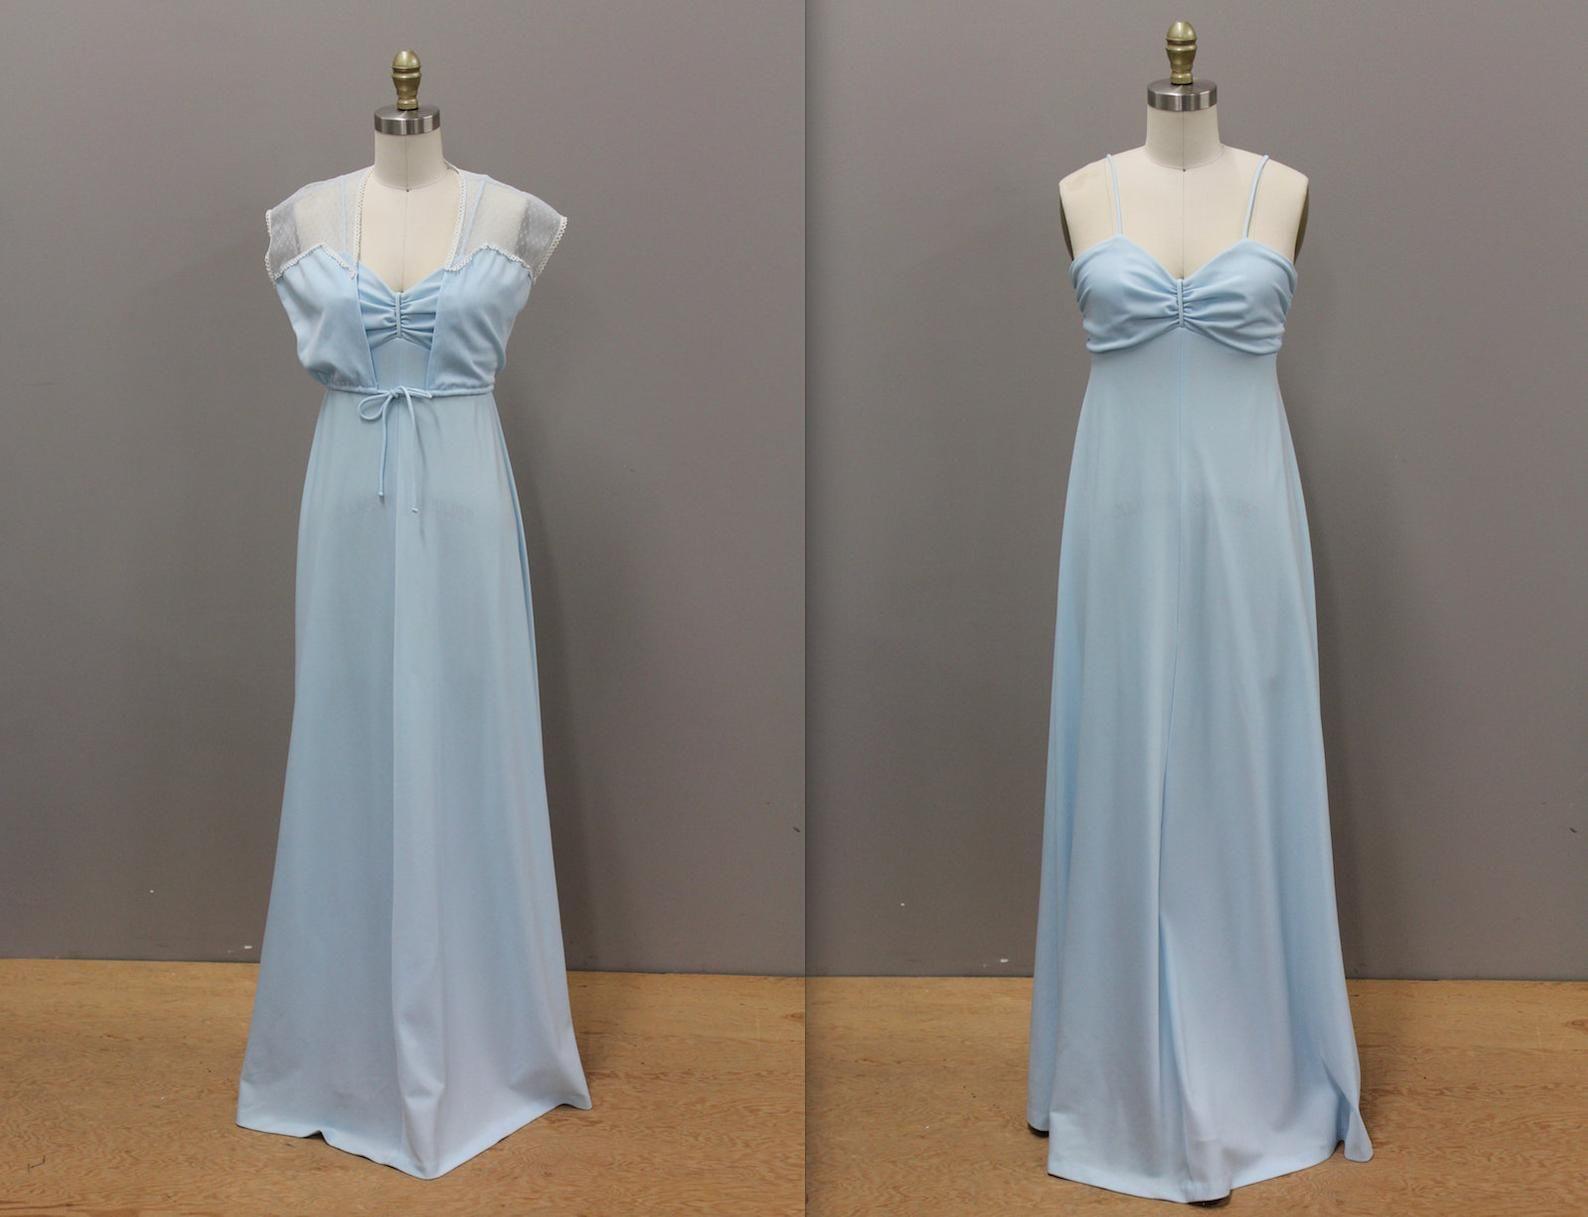 Vintage 1970s Blue Prom Dress 1970s Sky Blue Peasant Dress Etsy Prom Dresses Blue Dresses Prom Dresses [ 1217 x 1588 Pixel ]